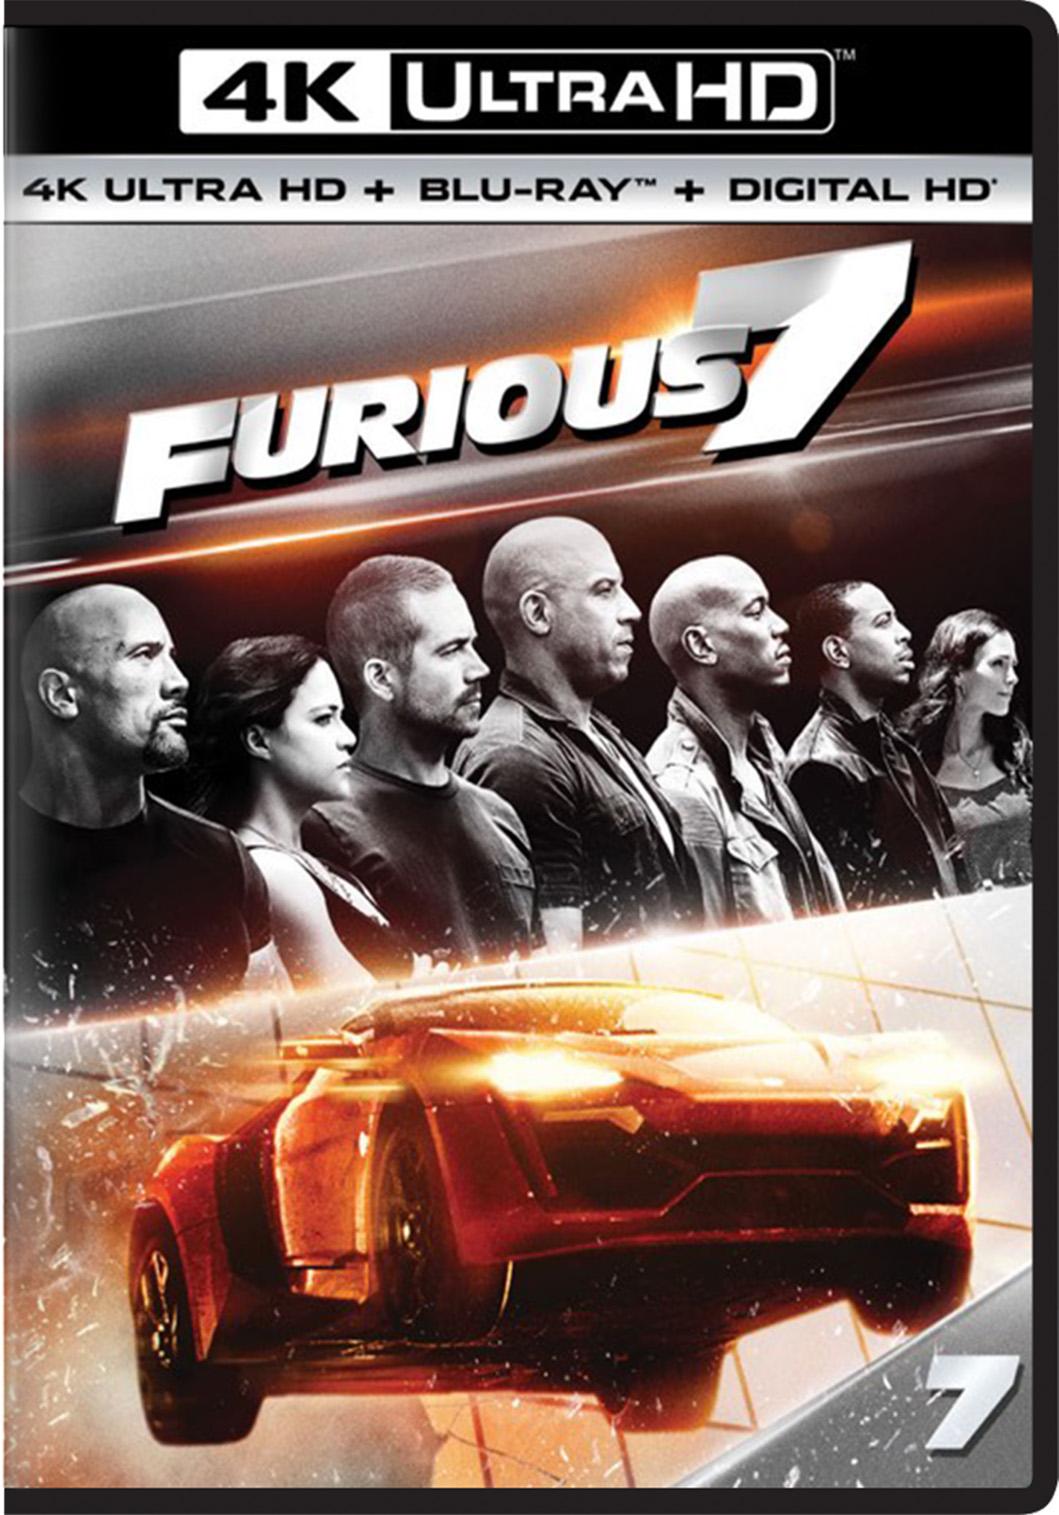 Furious 7 (2015) Deal